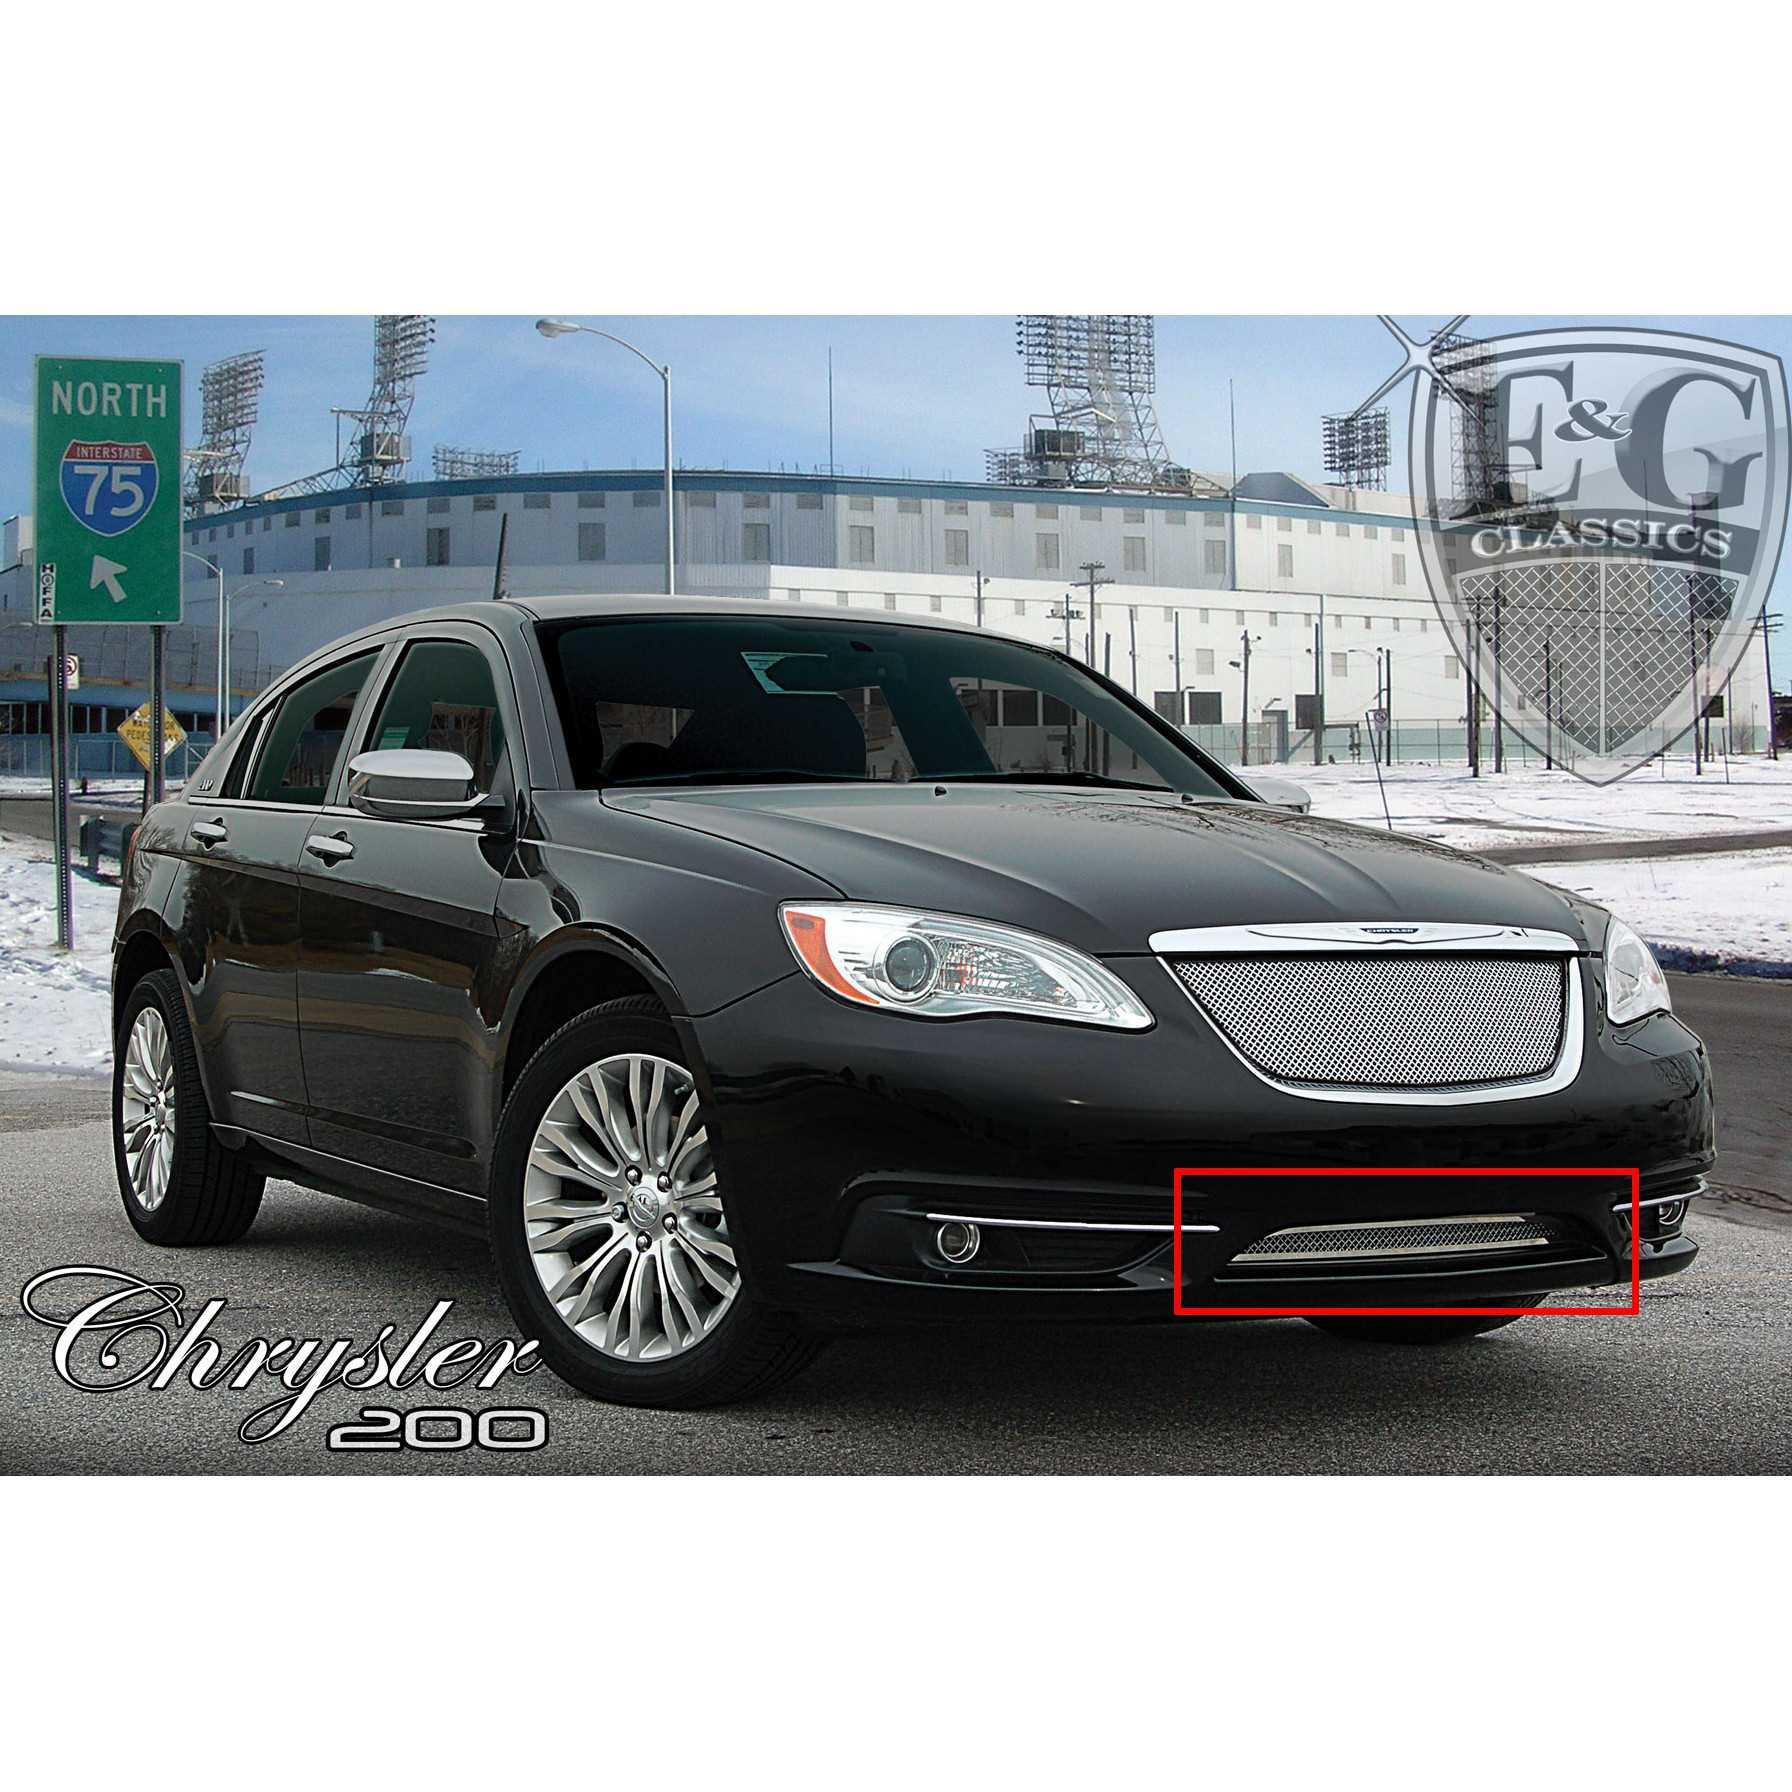 E&G Classics 2011-2014 Chrysler 200 Grille Lower Only Fine